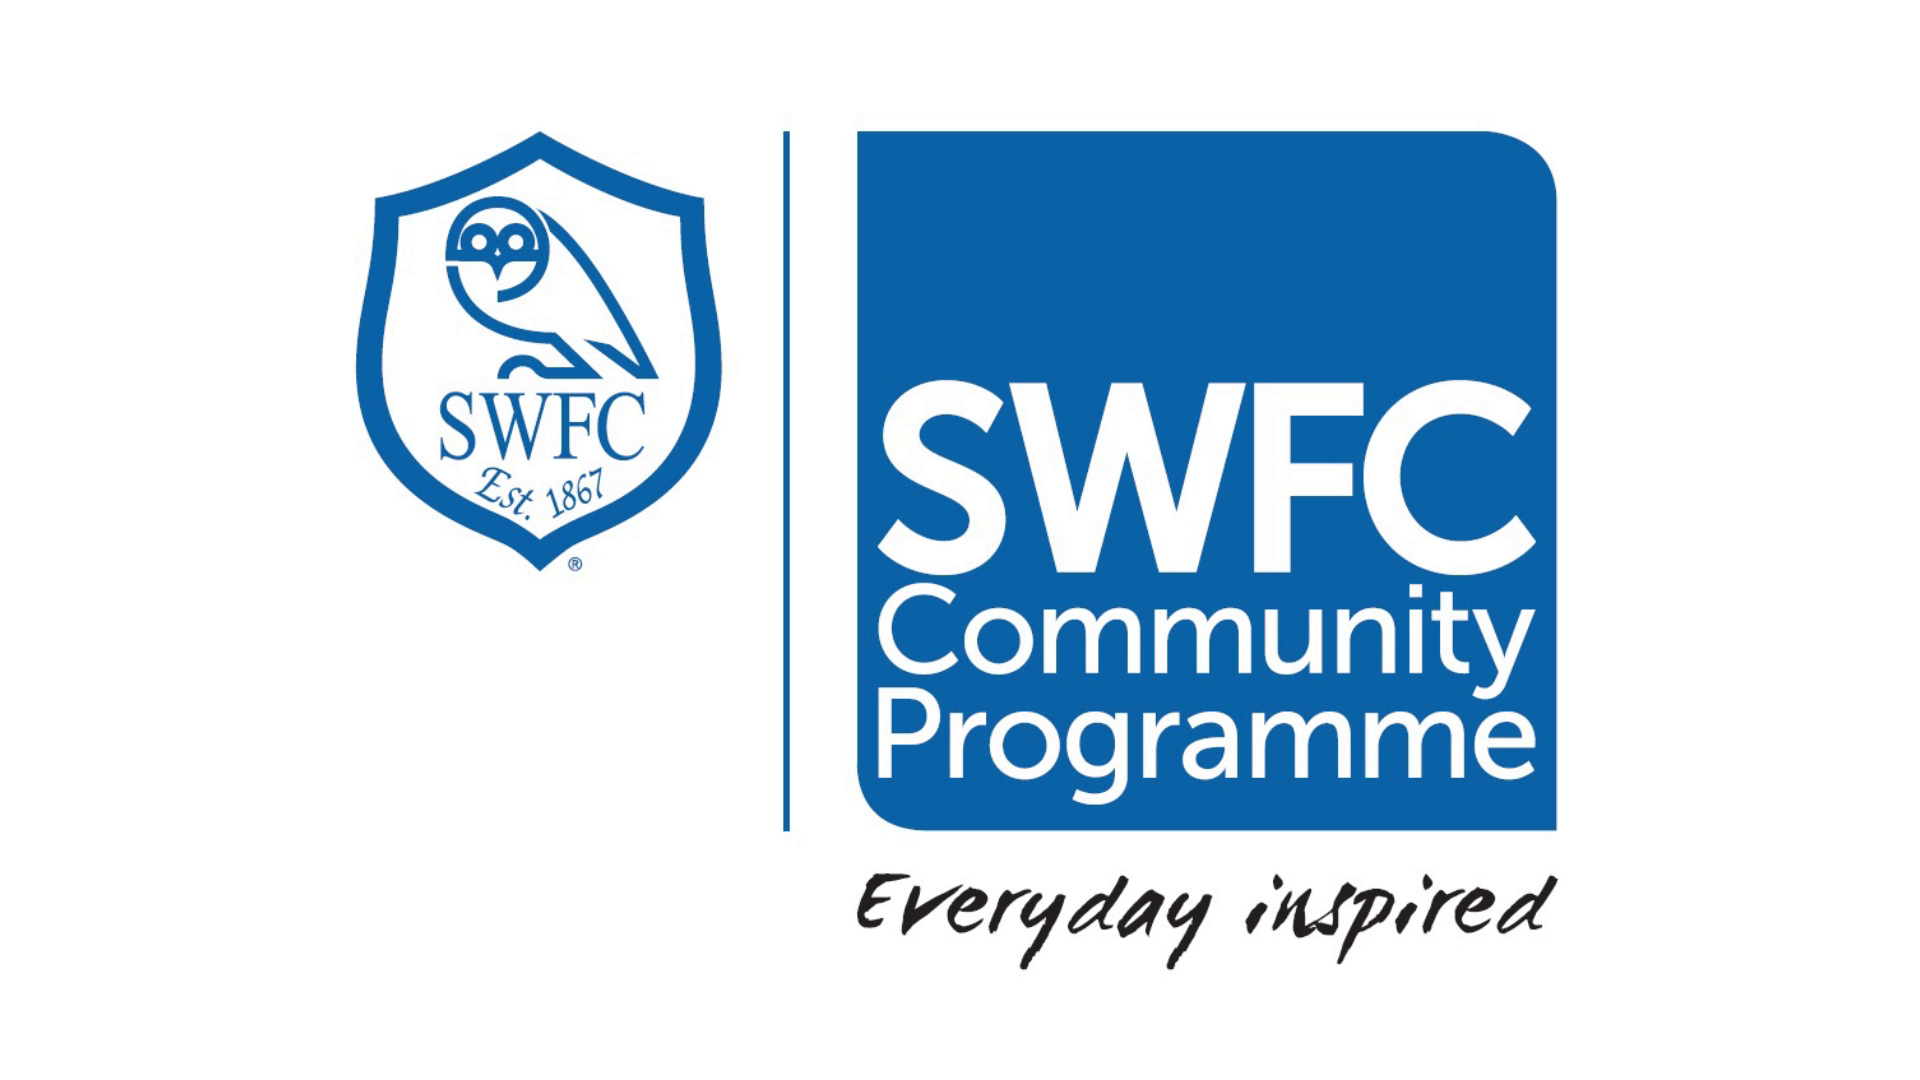 SWFC Community Programme